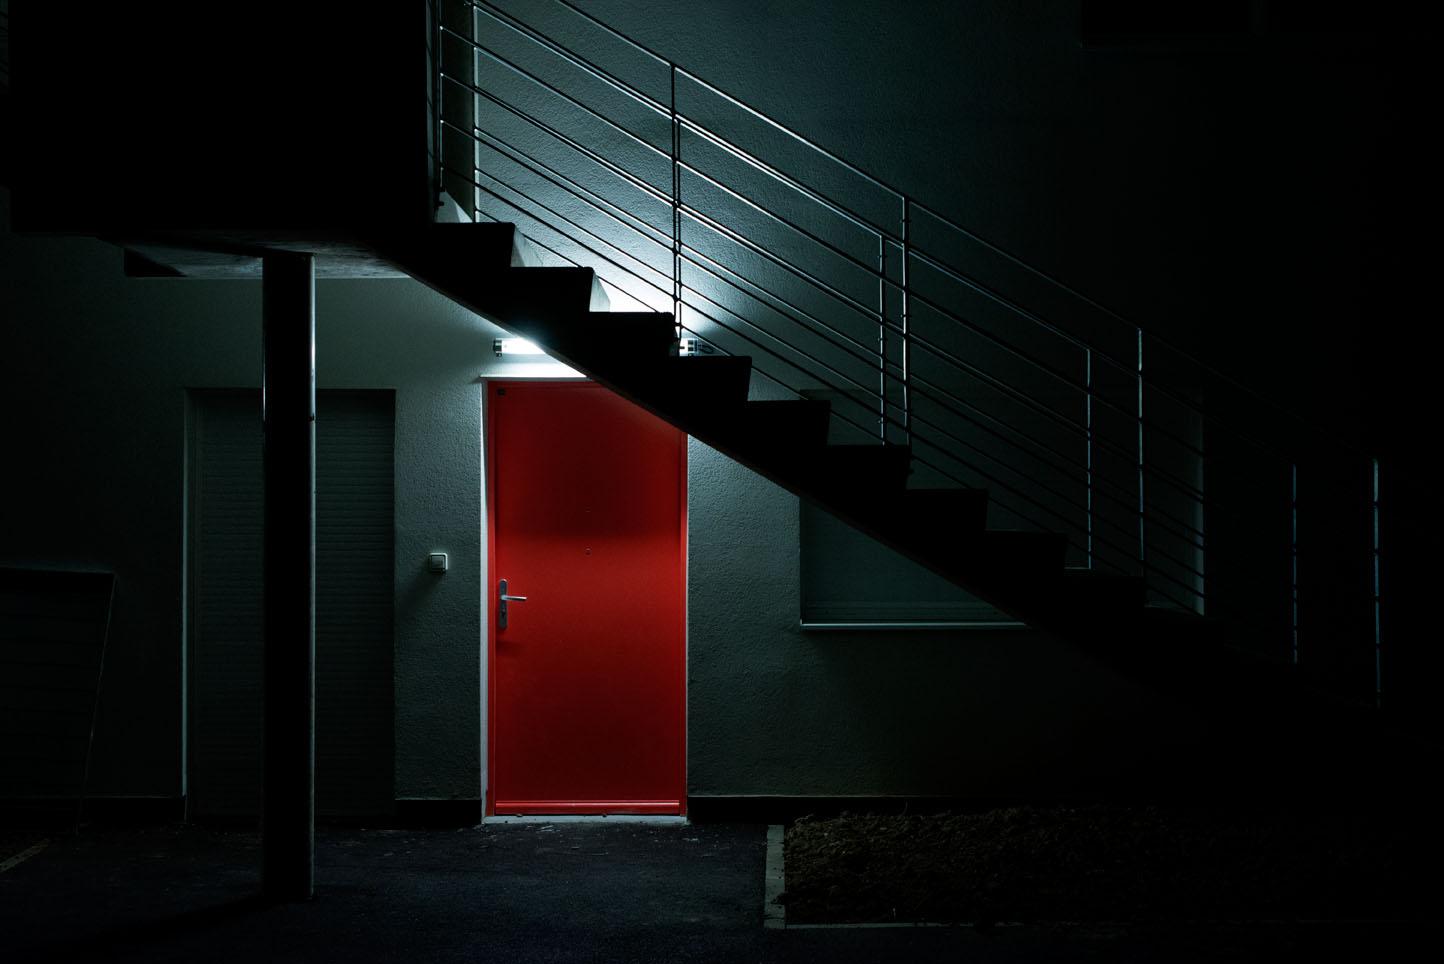 kathleen_meier_hostilités_sourdes_photography_visual atelier 8_3.jpg